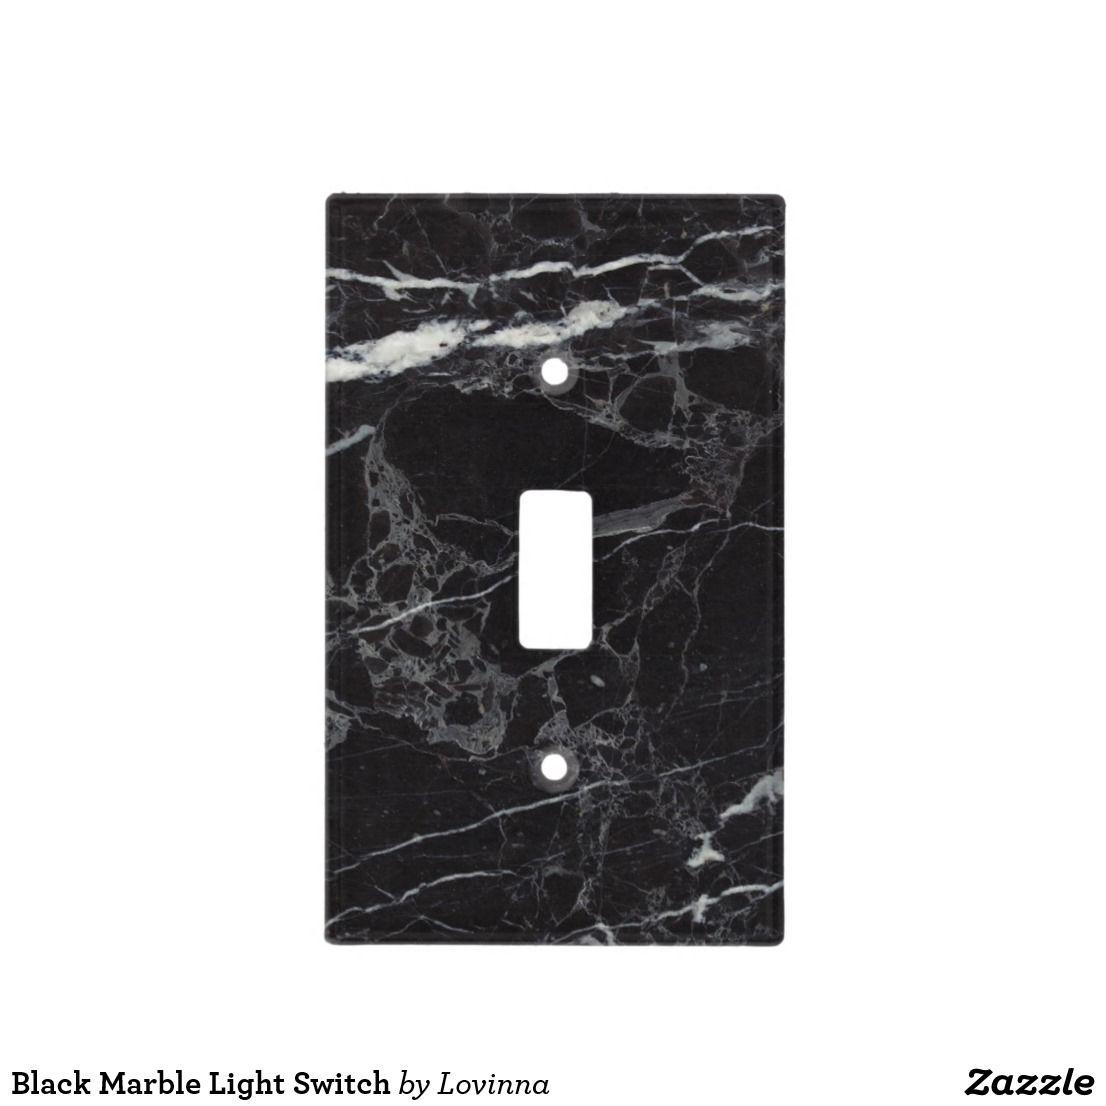 Black Marble Light Switch Zazzle Com In 2019 Black Switch Plates Black Light Switch Modern Light Switches Black Marble